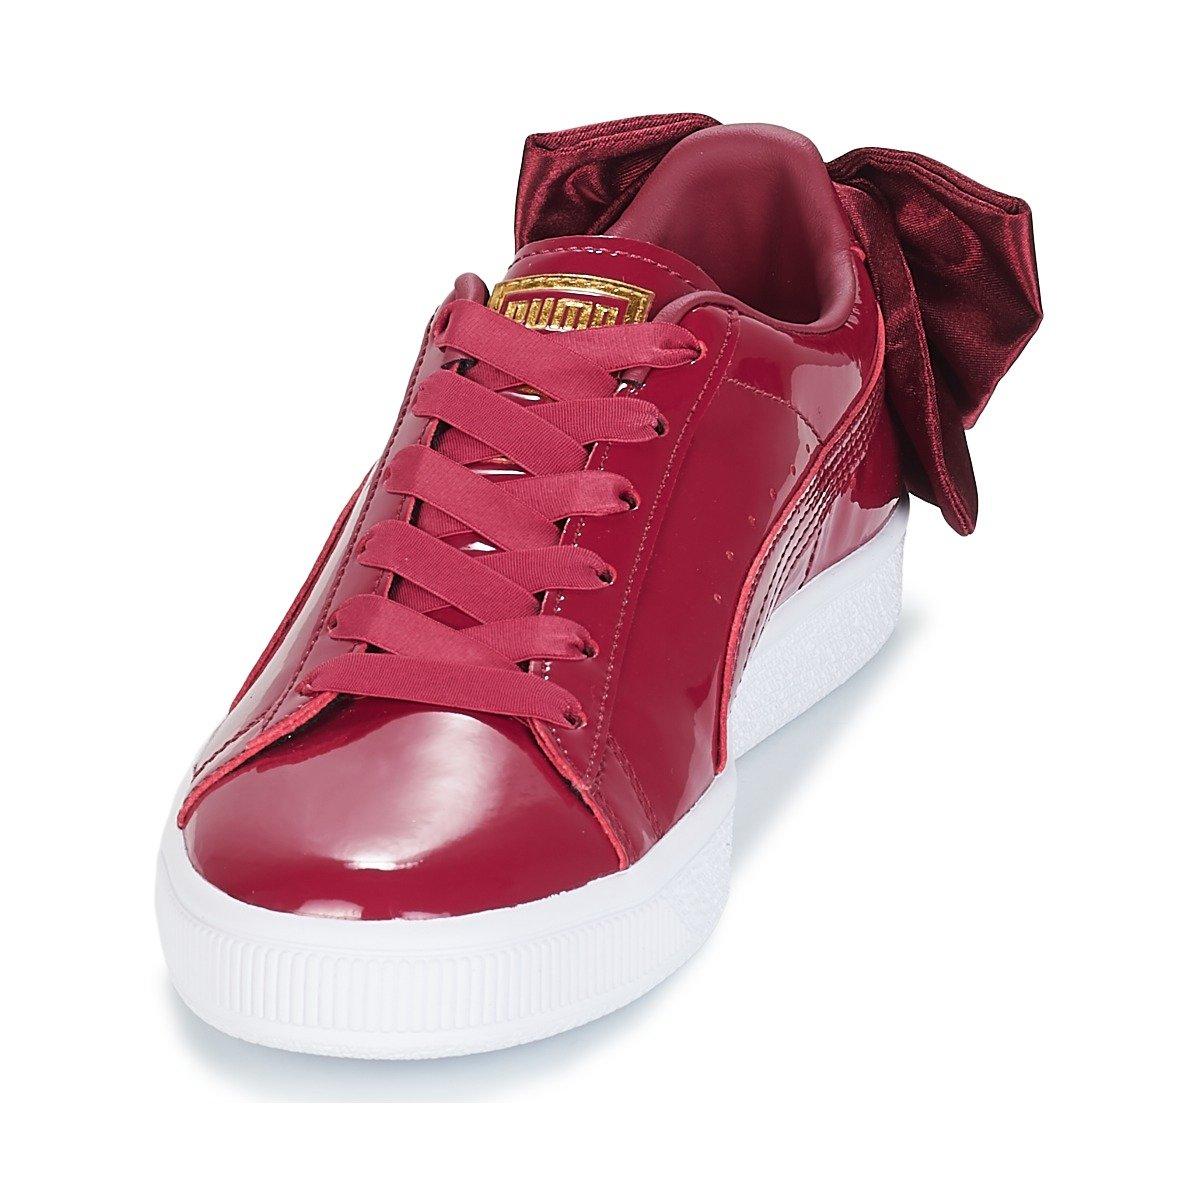 Wns Puma Tibetan Red Patent Basket Bow 36811804 v0mNwnO8